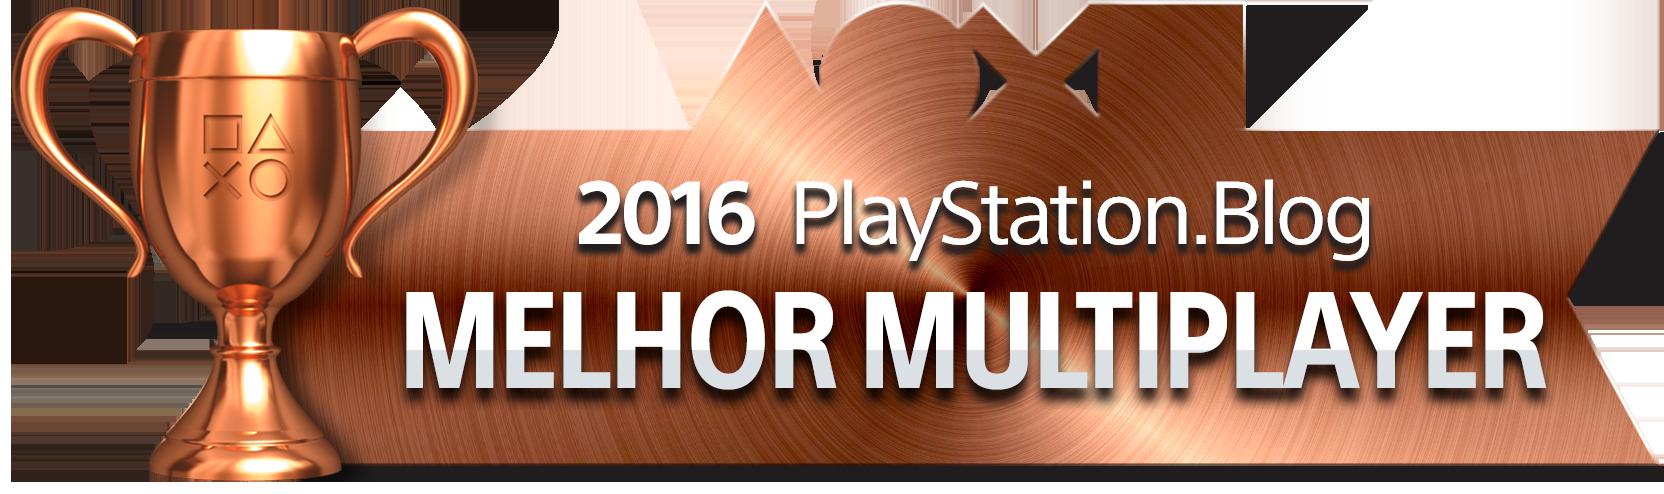 Melhor Multiplayer - Bronze